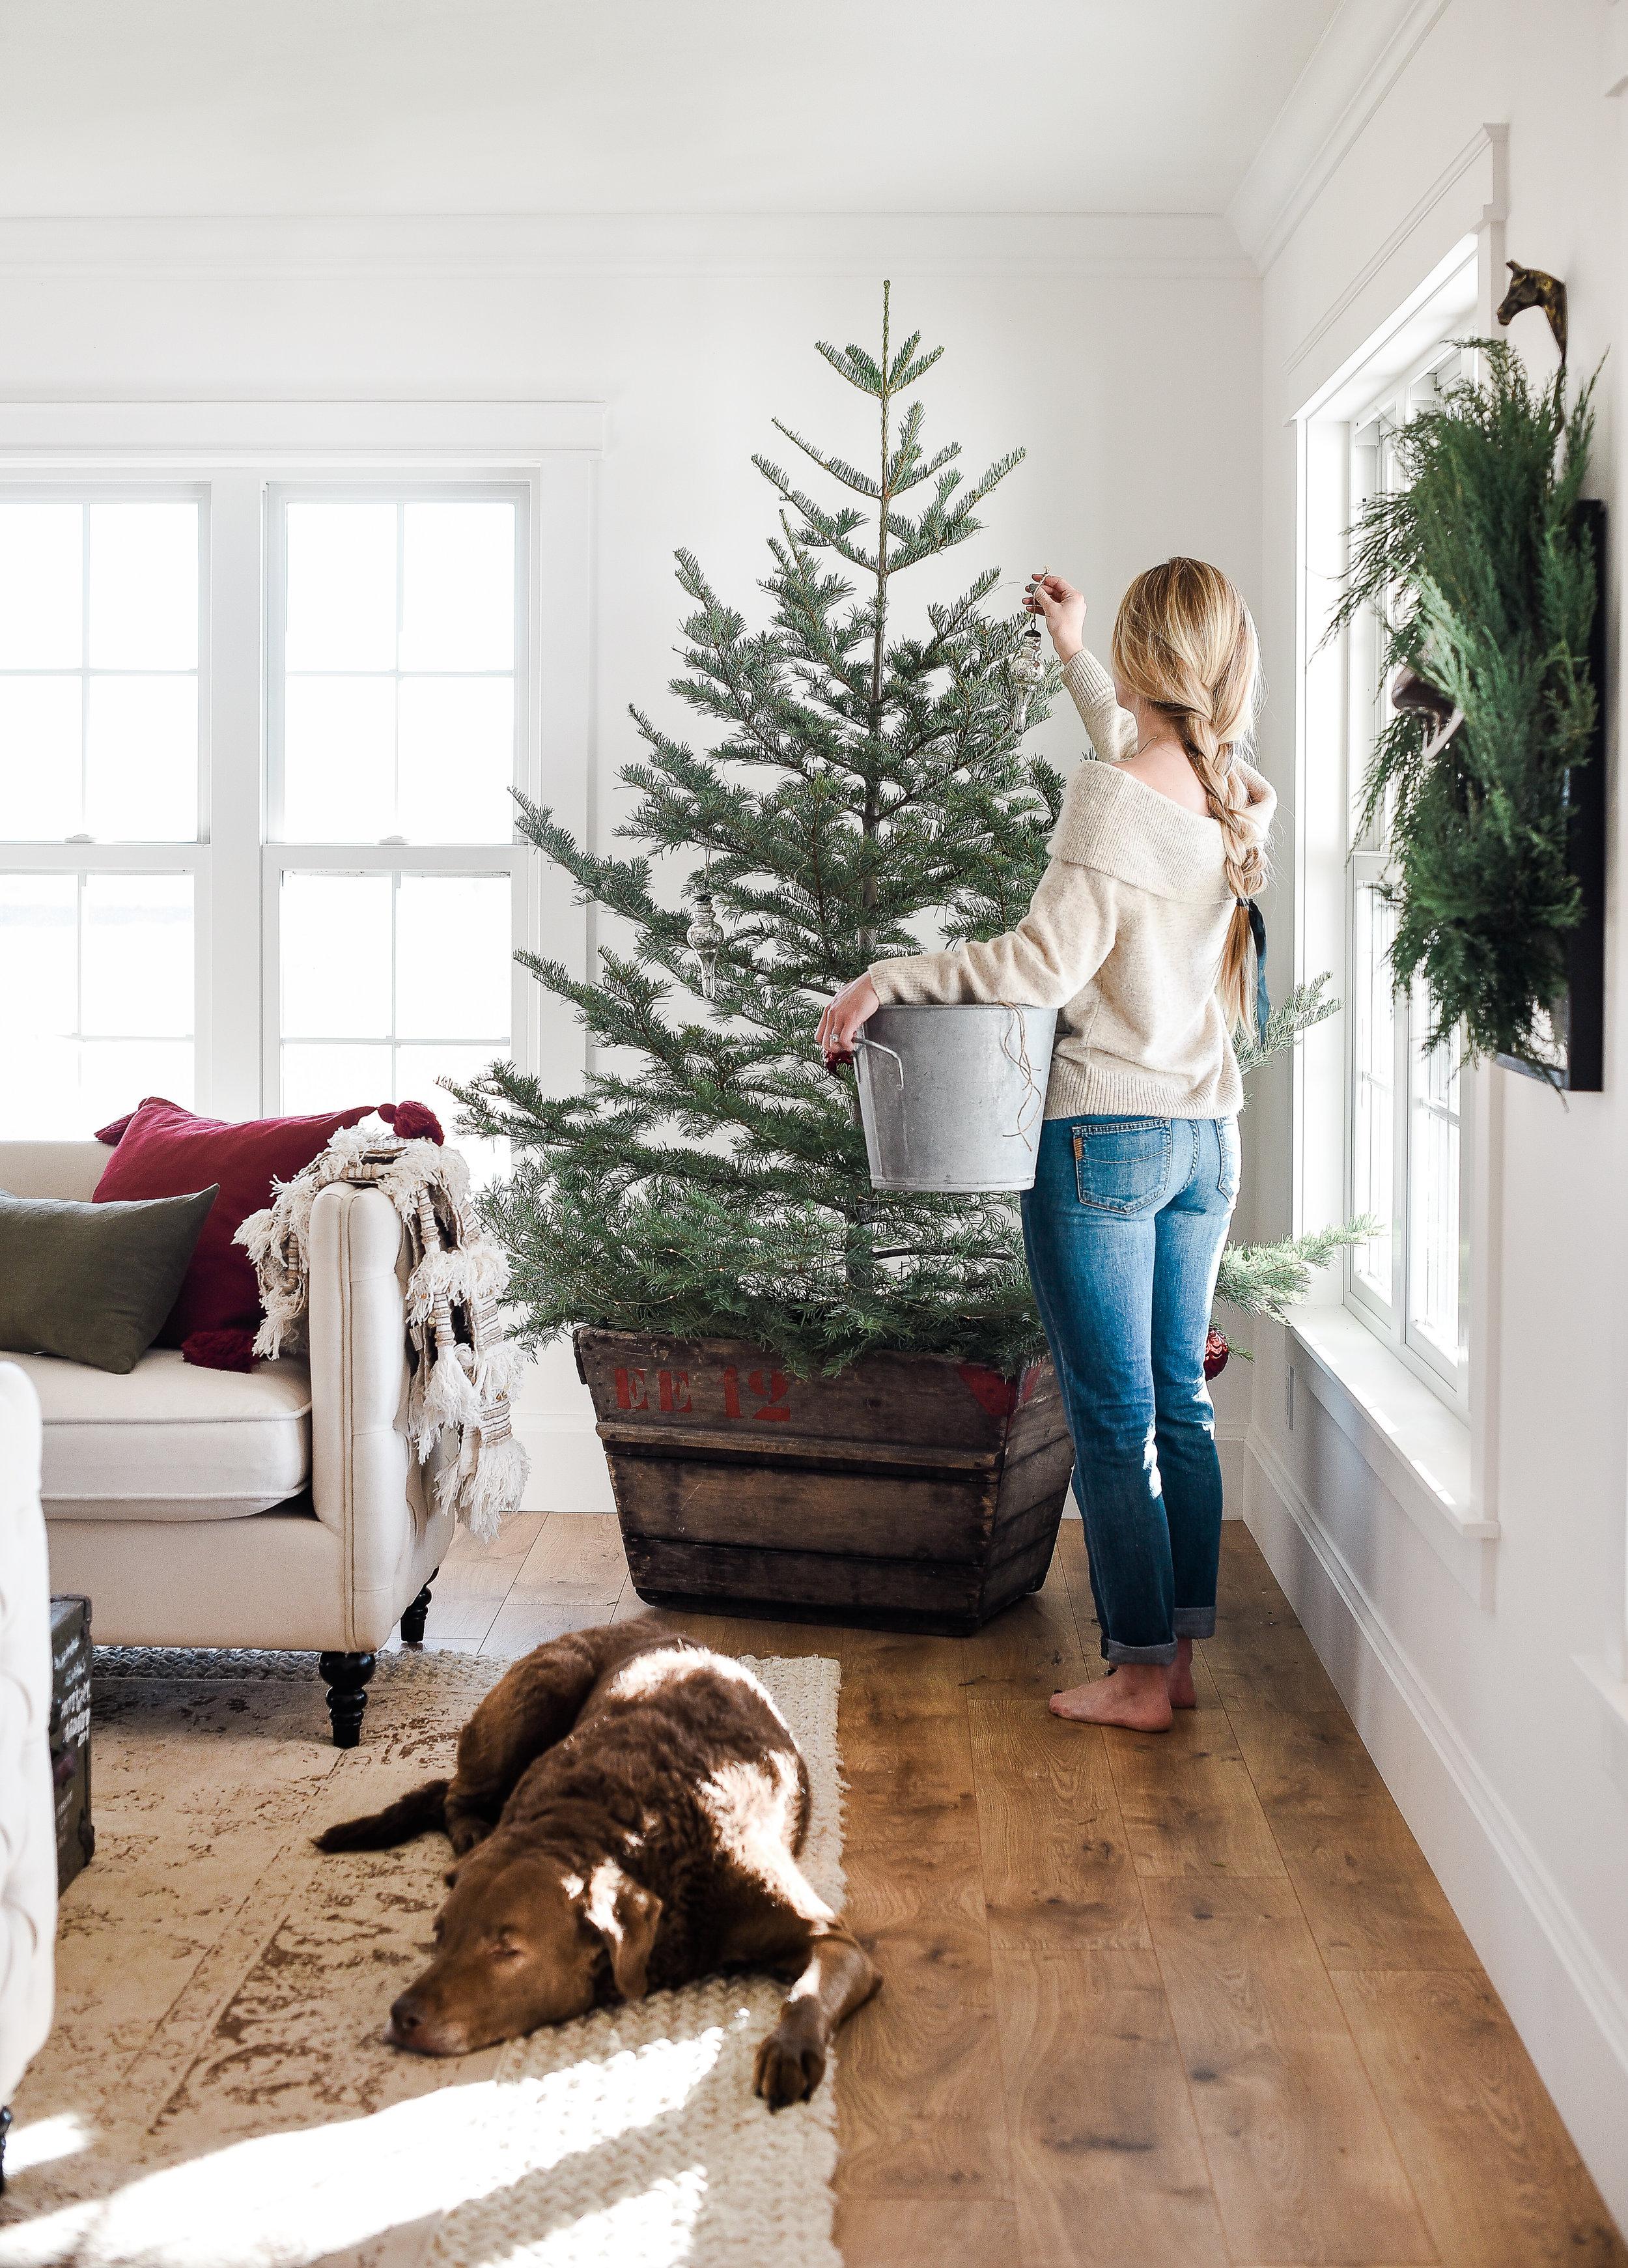 Farmhouse Christmas decorating ideas for a simple tree from boxwoodavenue.com